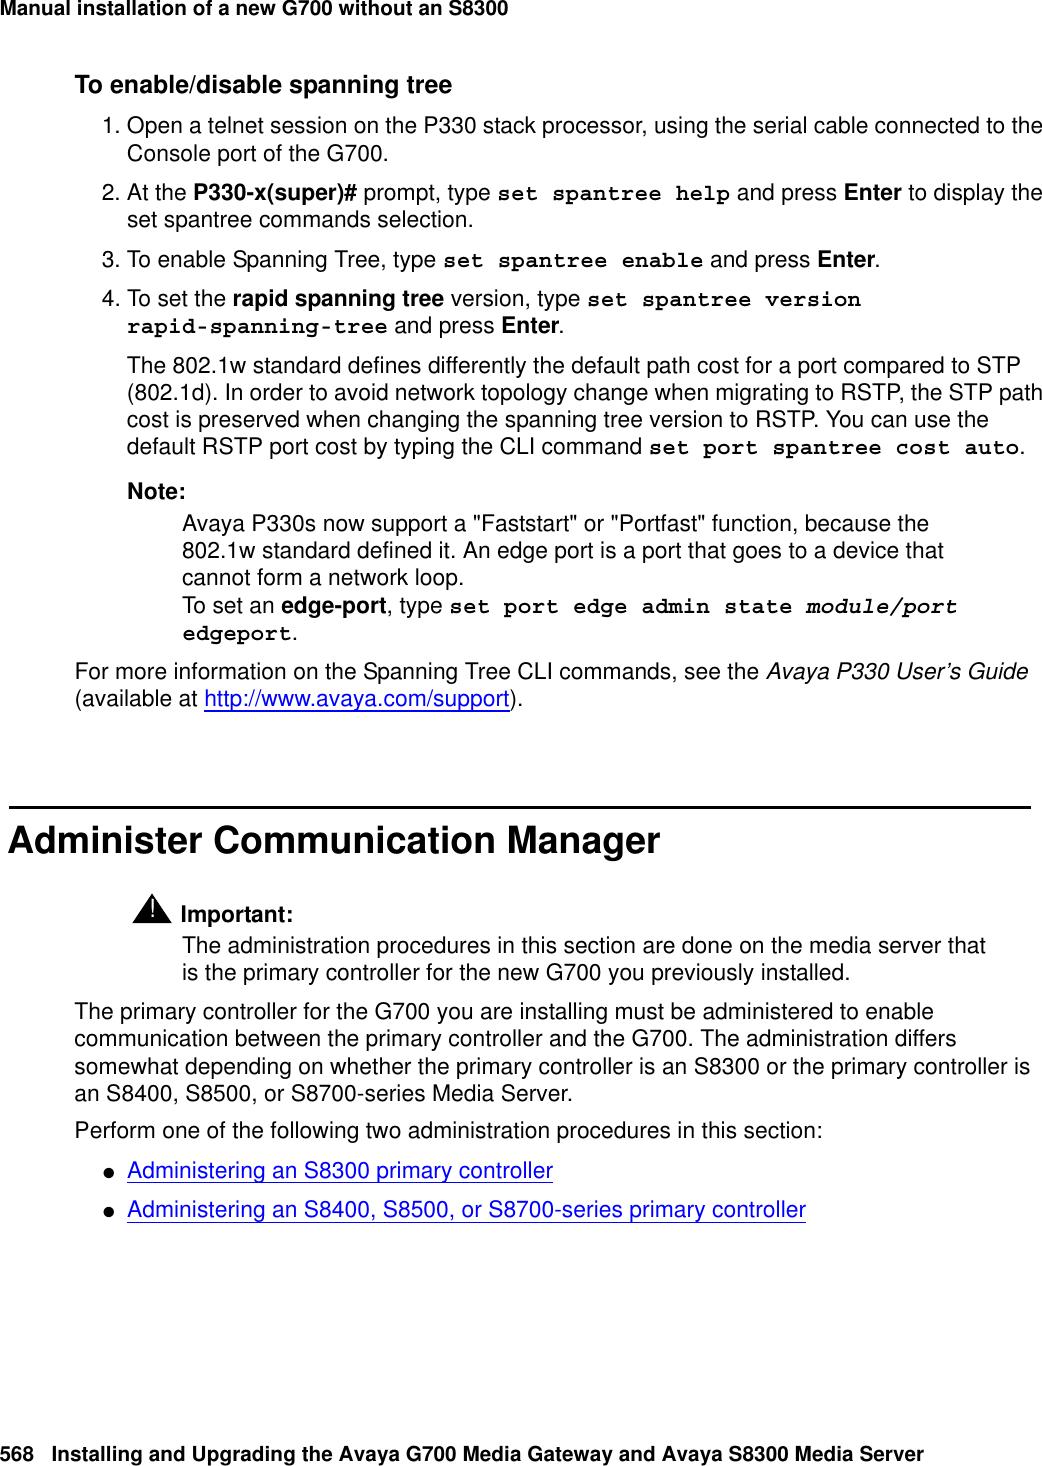 Avaya Media Gateway G700 Users Manual Installing And